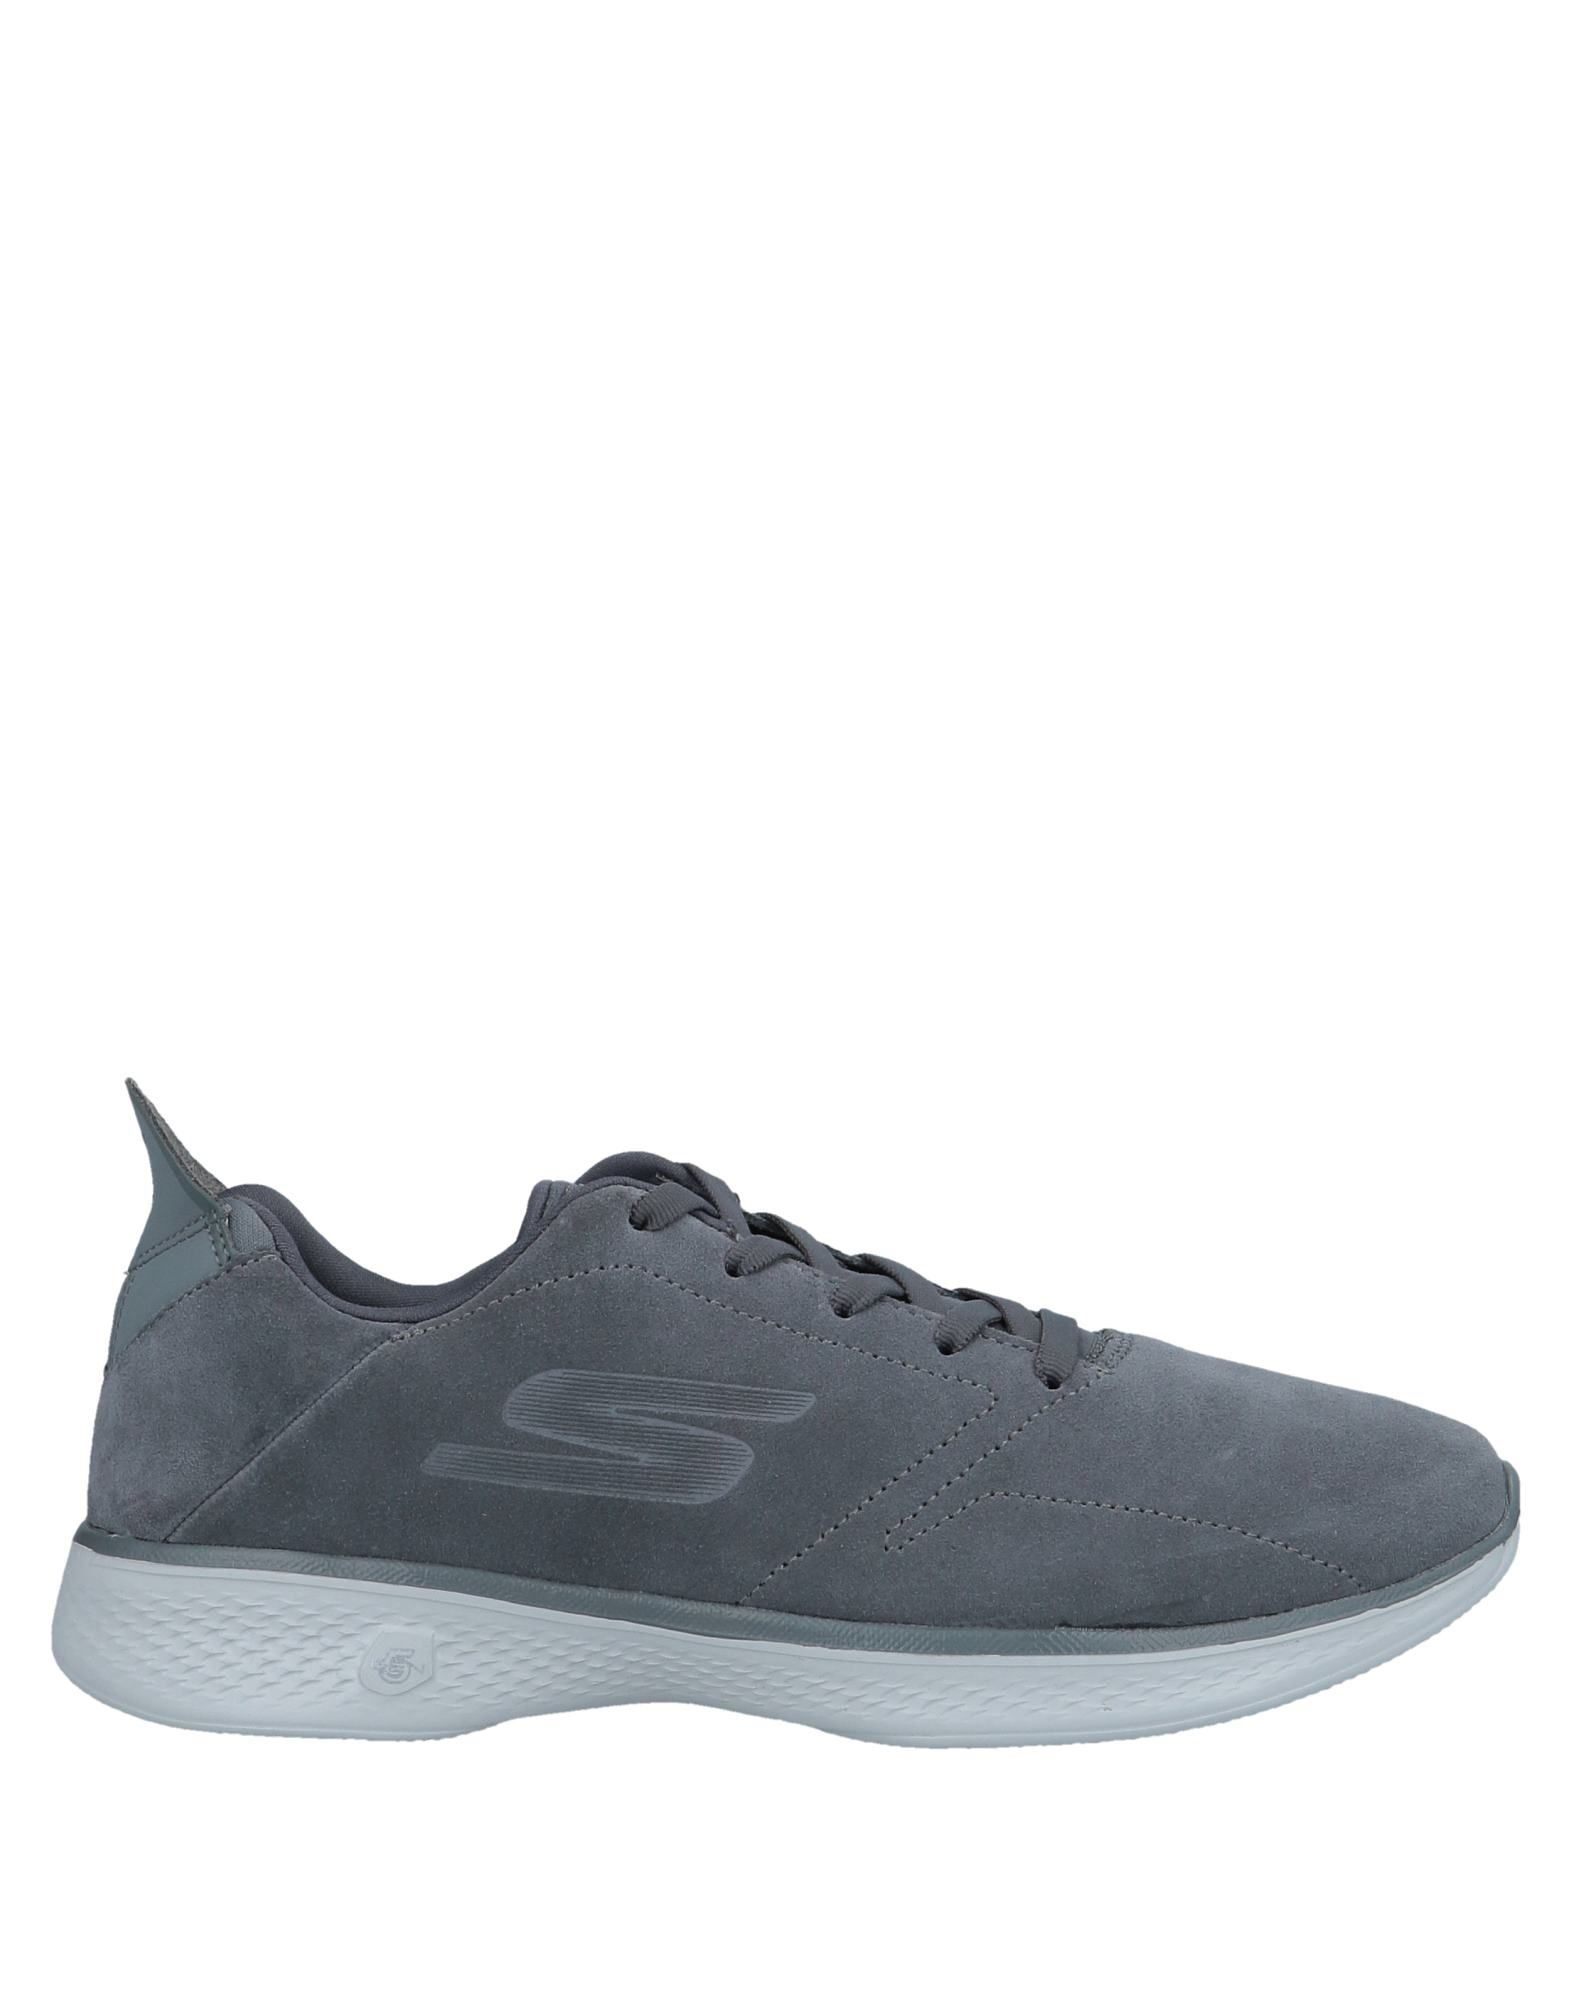 Sneakers Skechers Donna - 11554782PS distintive Scarpe comode e distintive 11554782PS b9c2ab